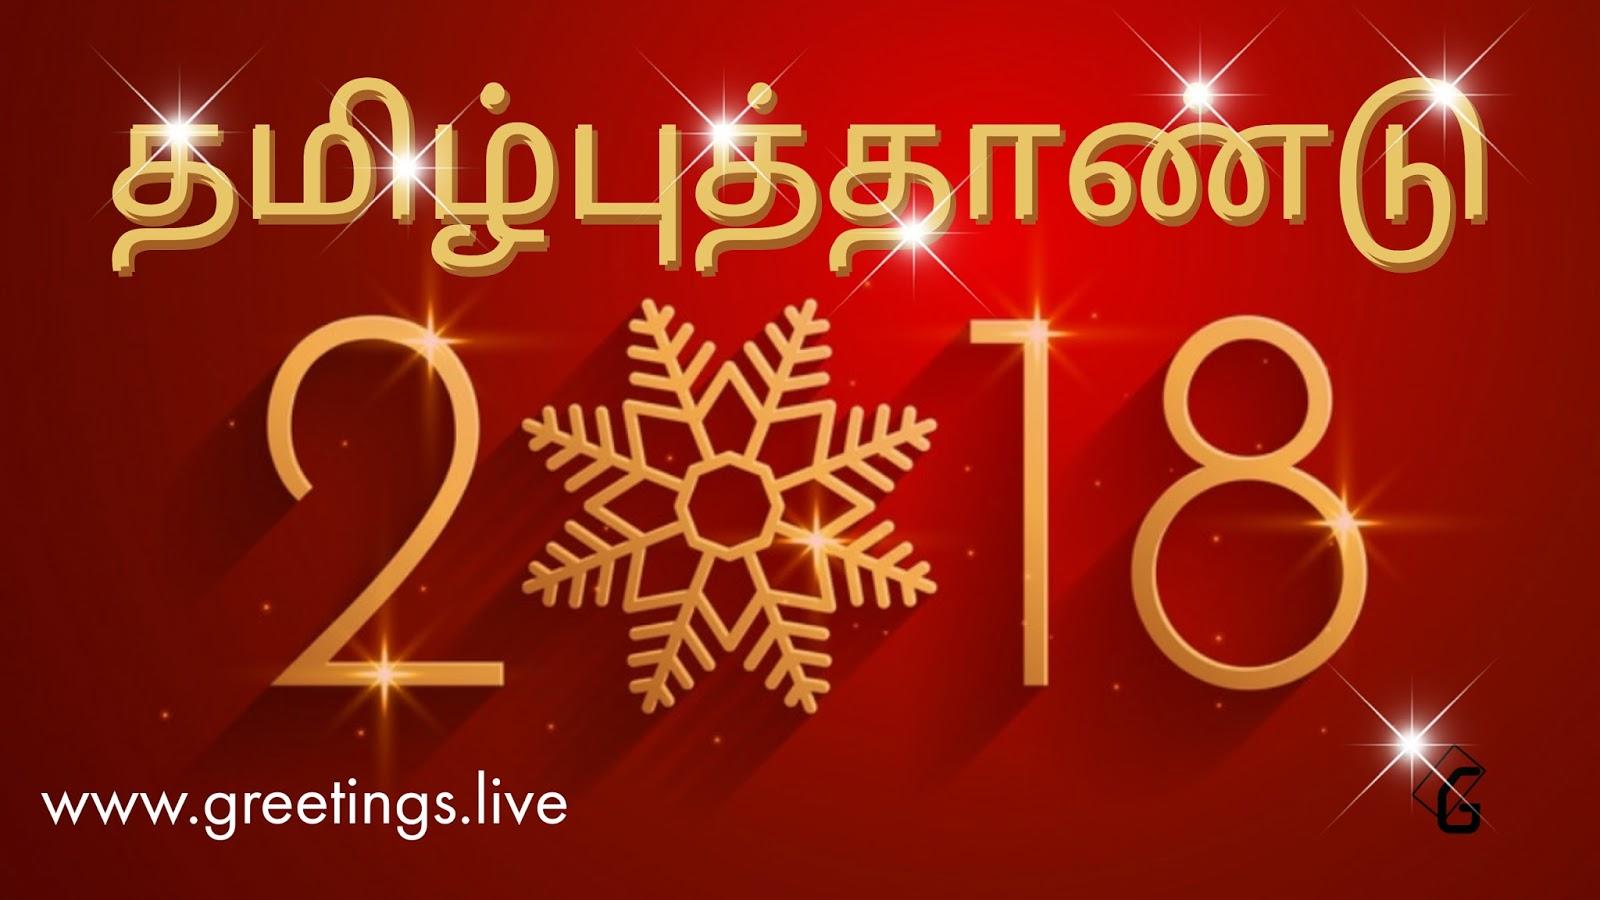 Free tamil new year greetings image collections greetings card turkish new year greetings gallery greetings card design simple m4hsunfo